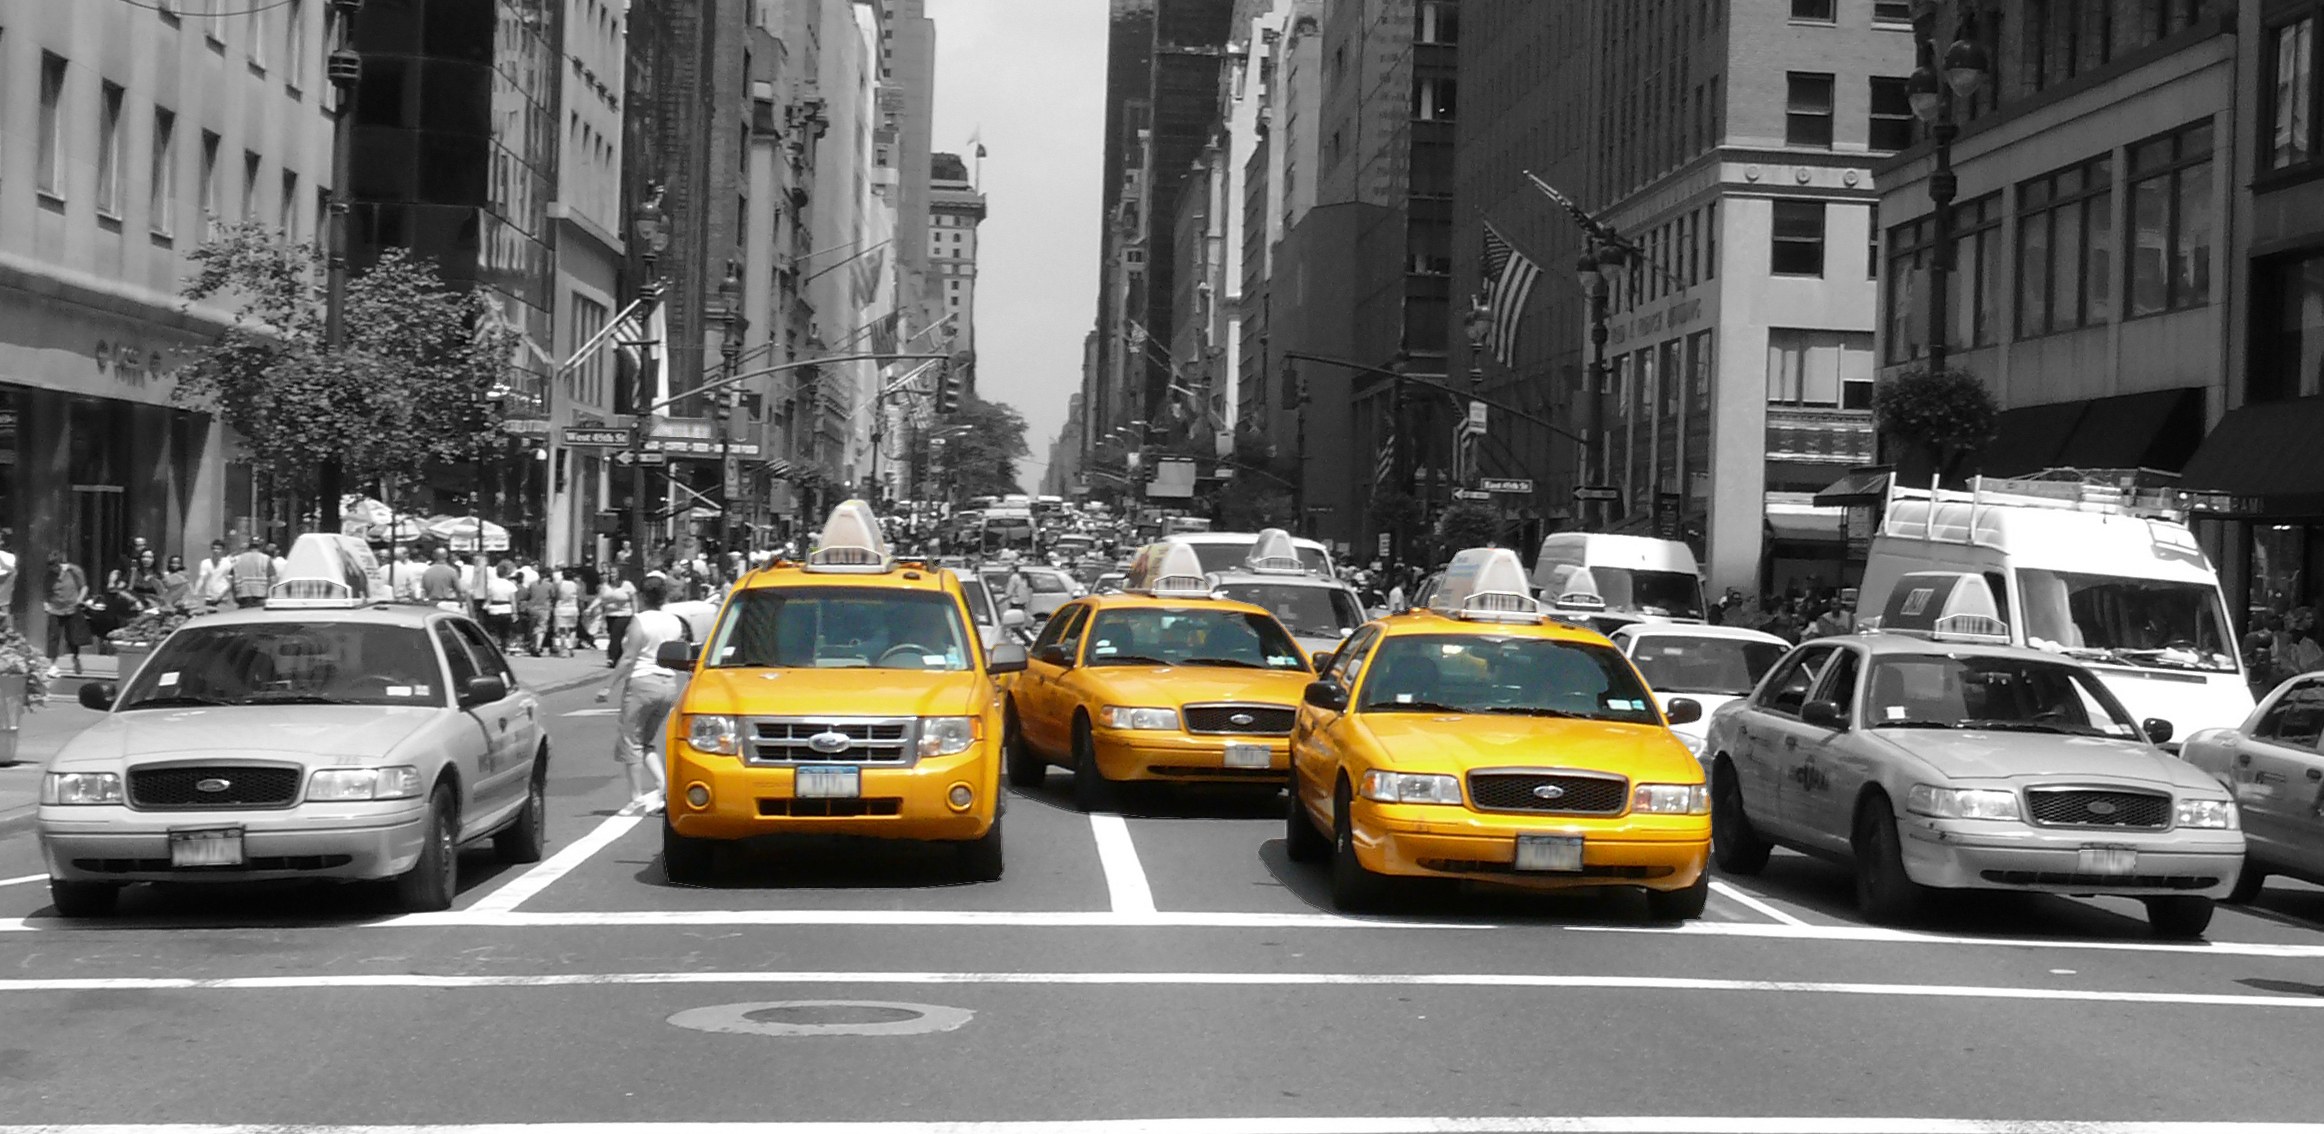 Taxi Milpitas 95035 / SFO via 237/101 only